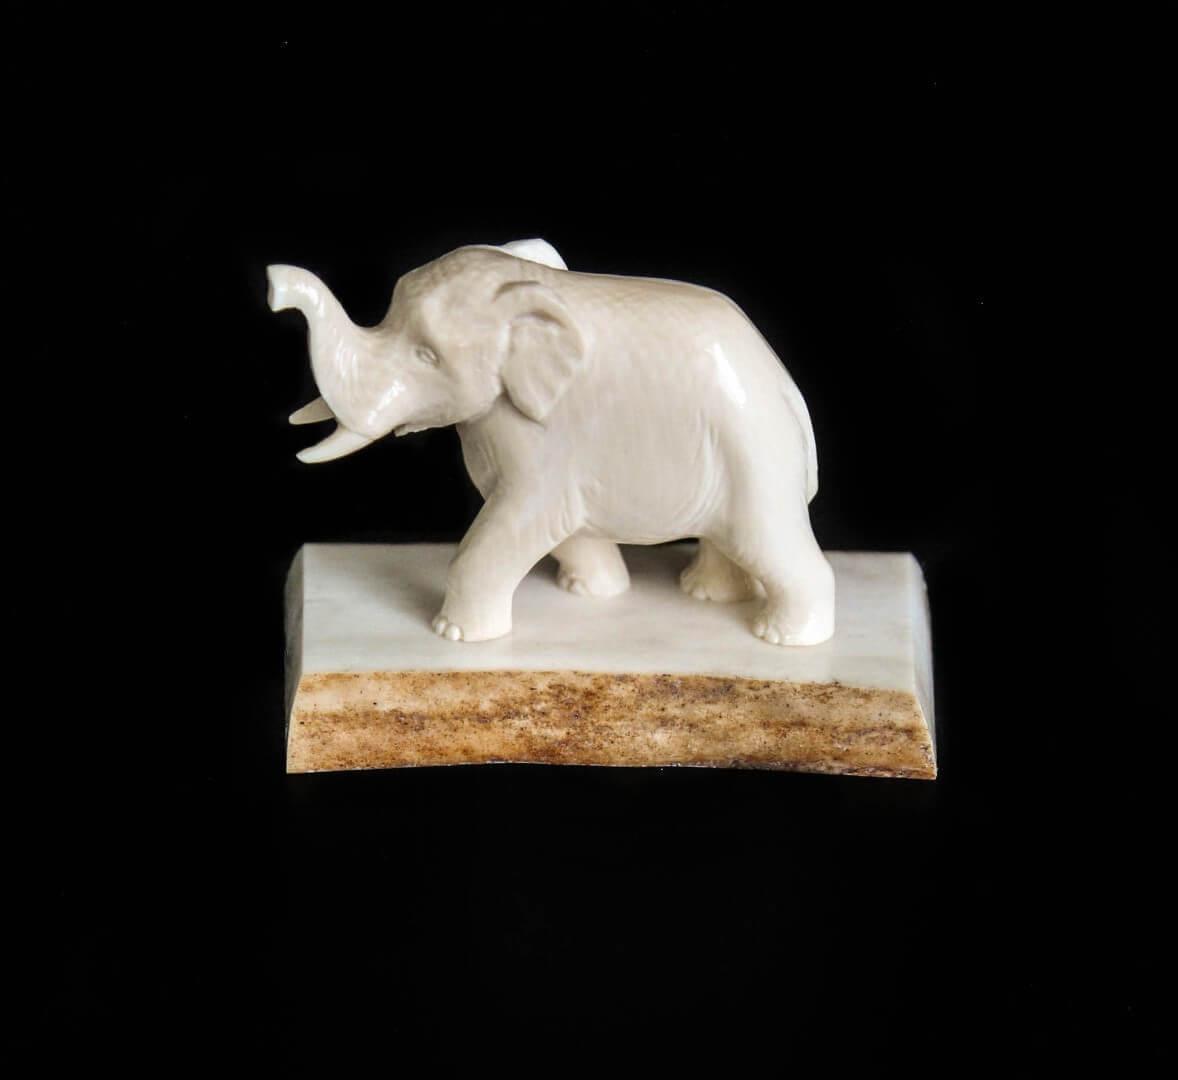 фигурка слона из бивня мамонта